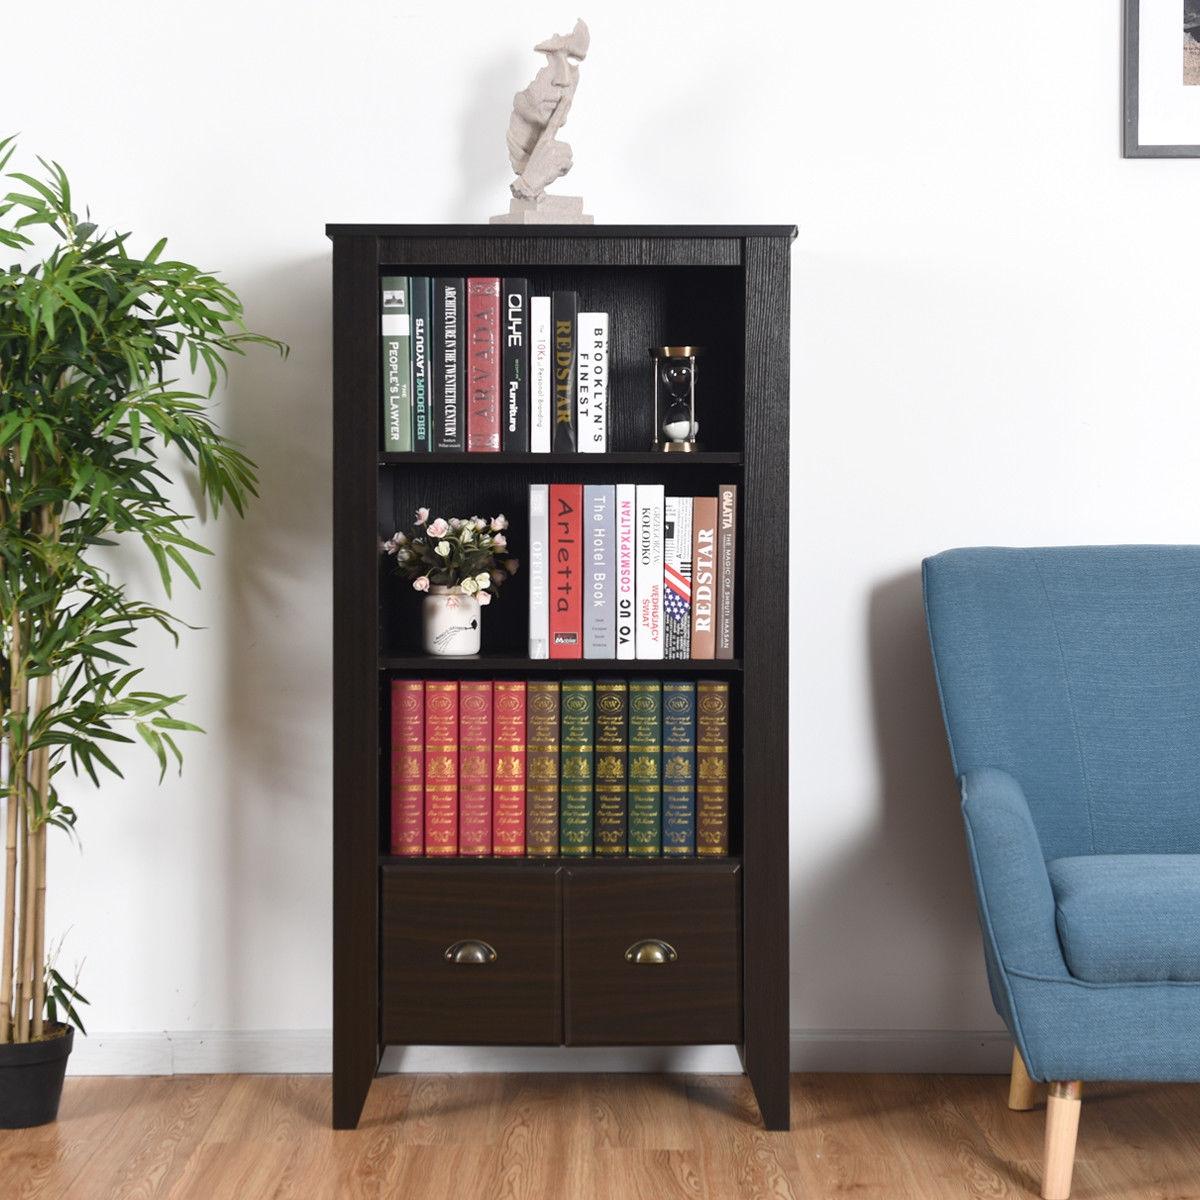 3 Shelf Adjustable Antique Organizer Bookcase with 2 Drawers